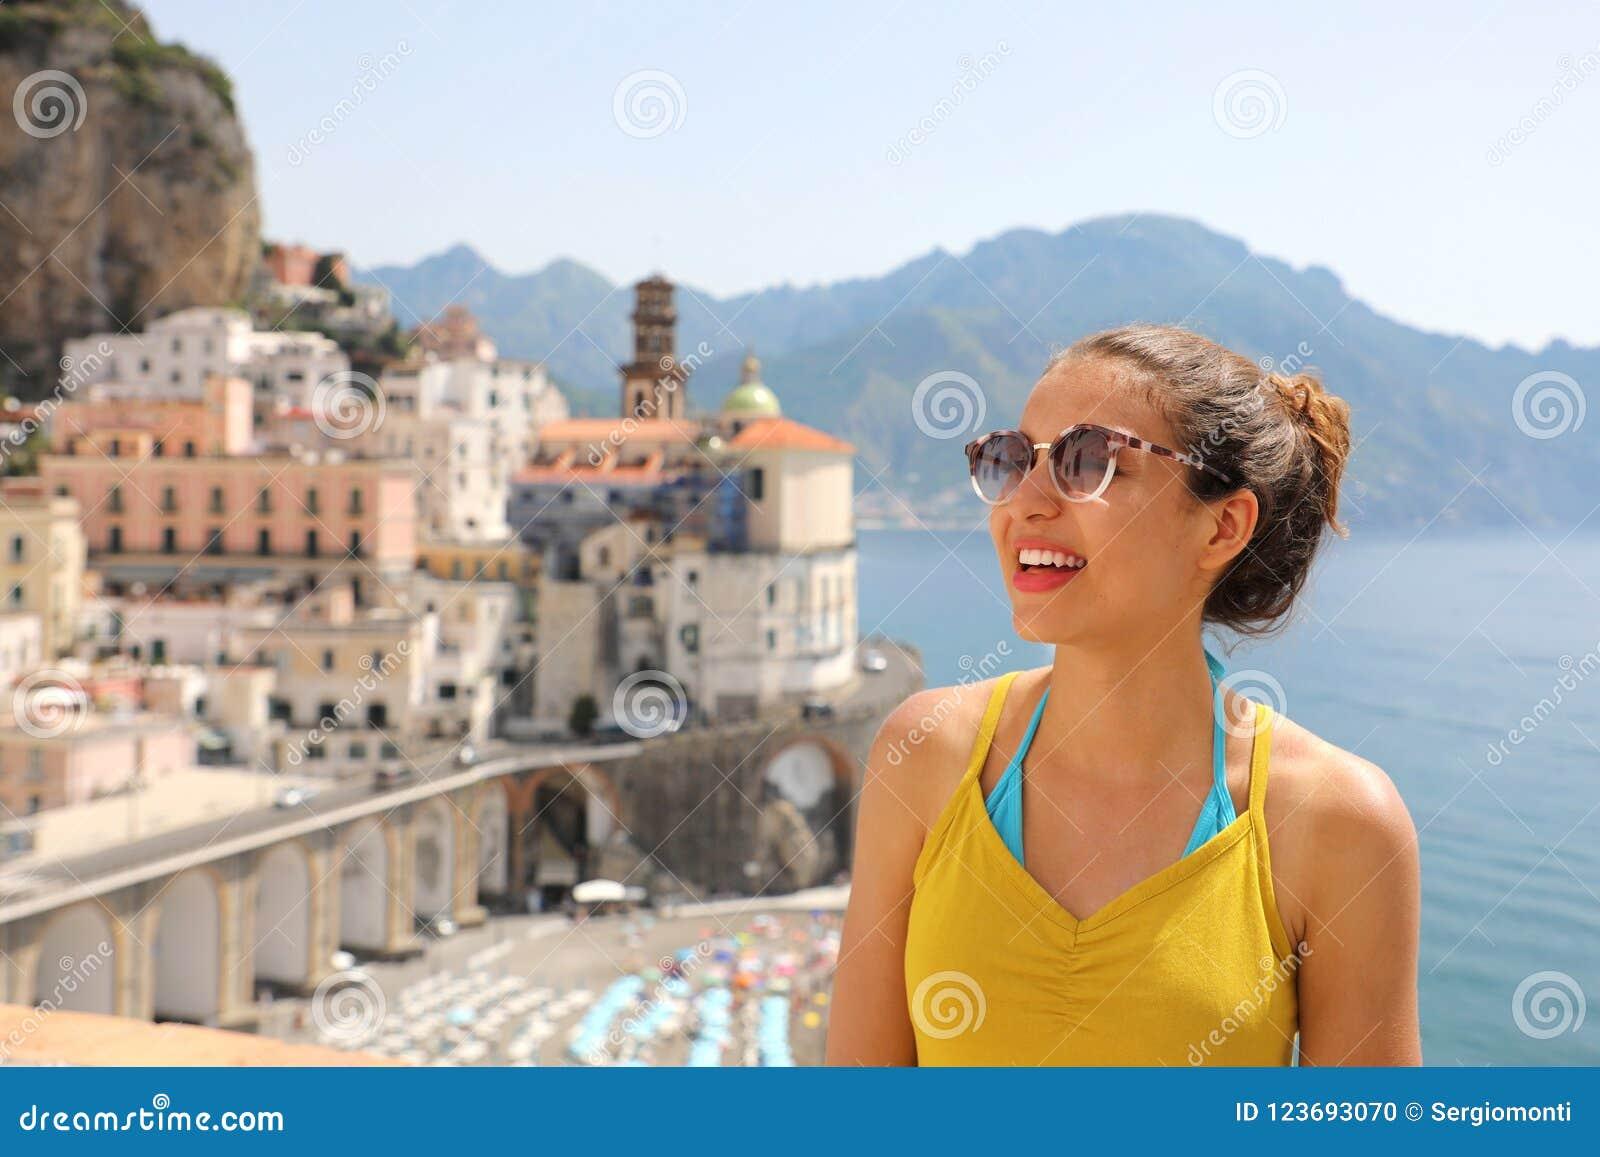 Portret van jonge glimlachende vrouw met zonnebril in Atrani-dorp, Amalfi Kust, Italië Beeld van vrouwelijke toerist